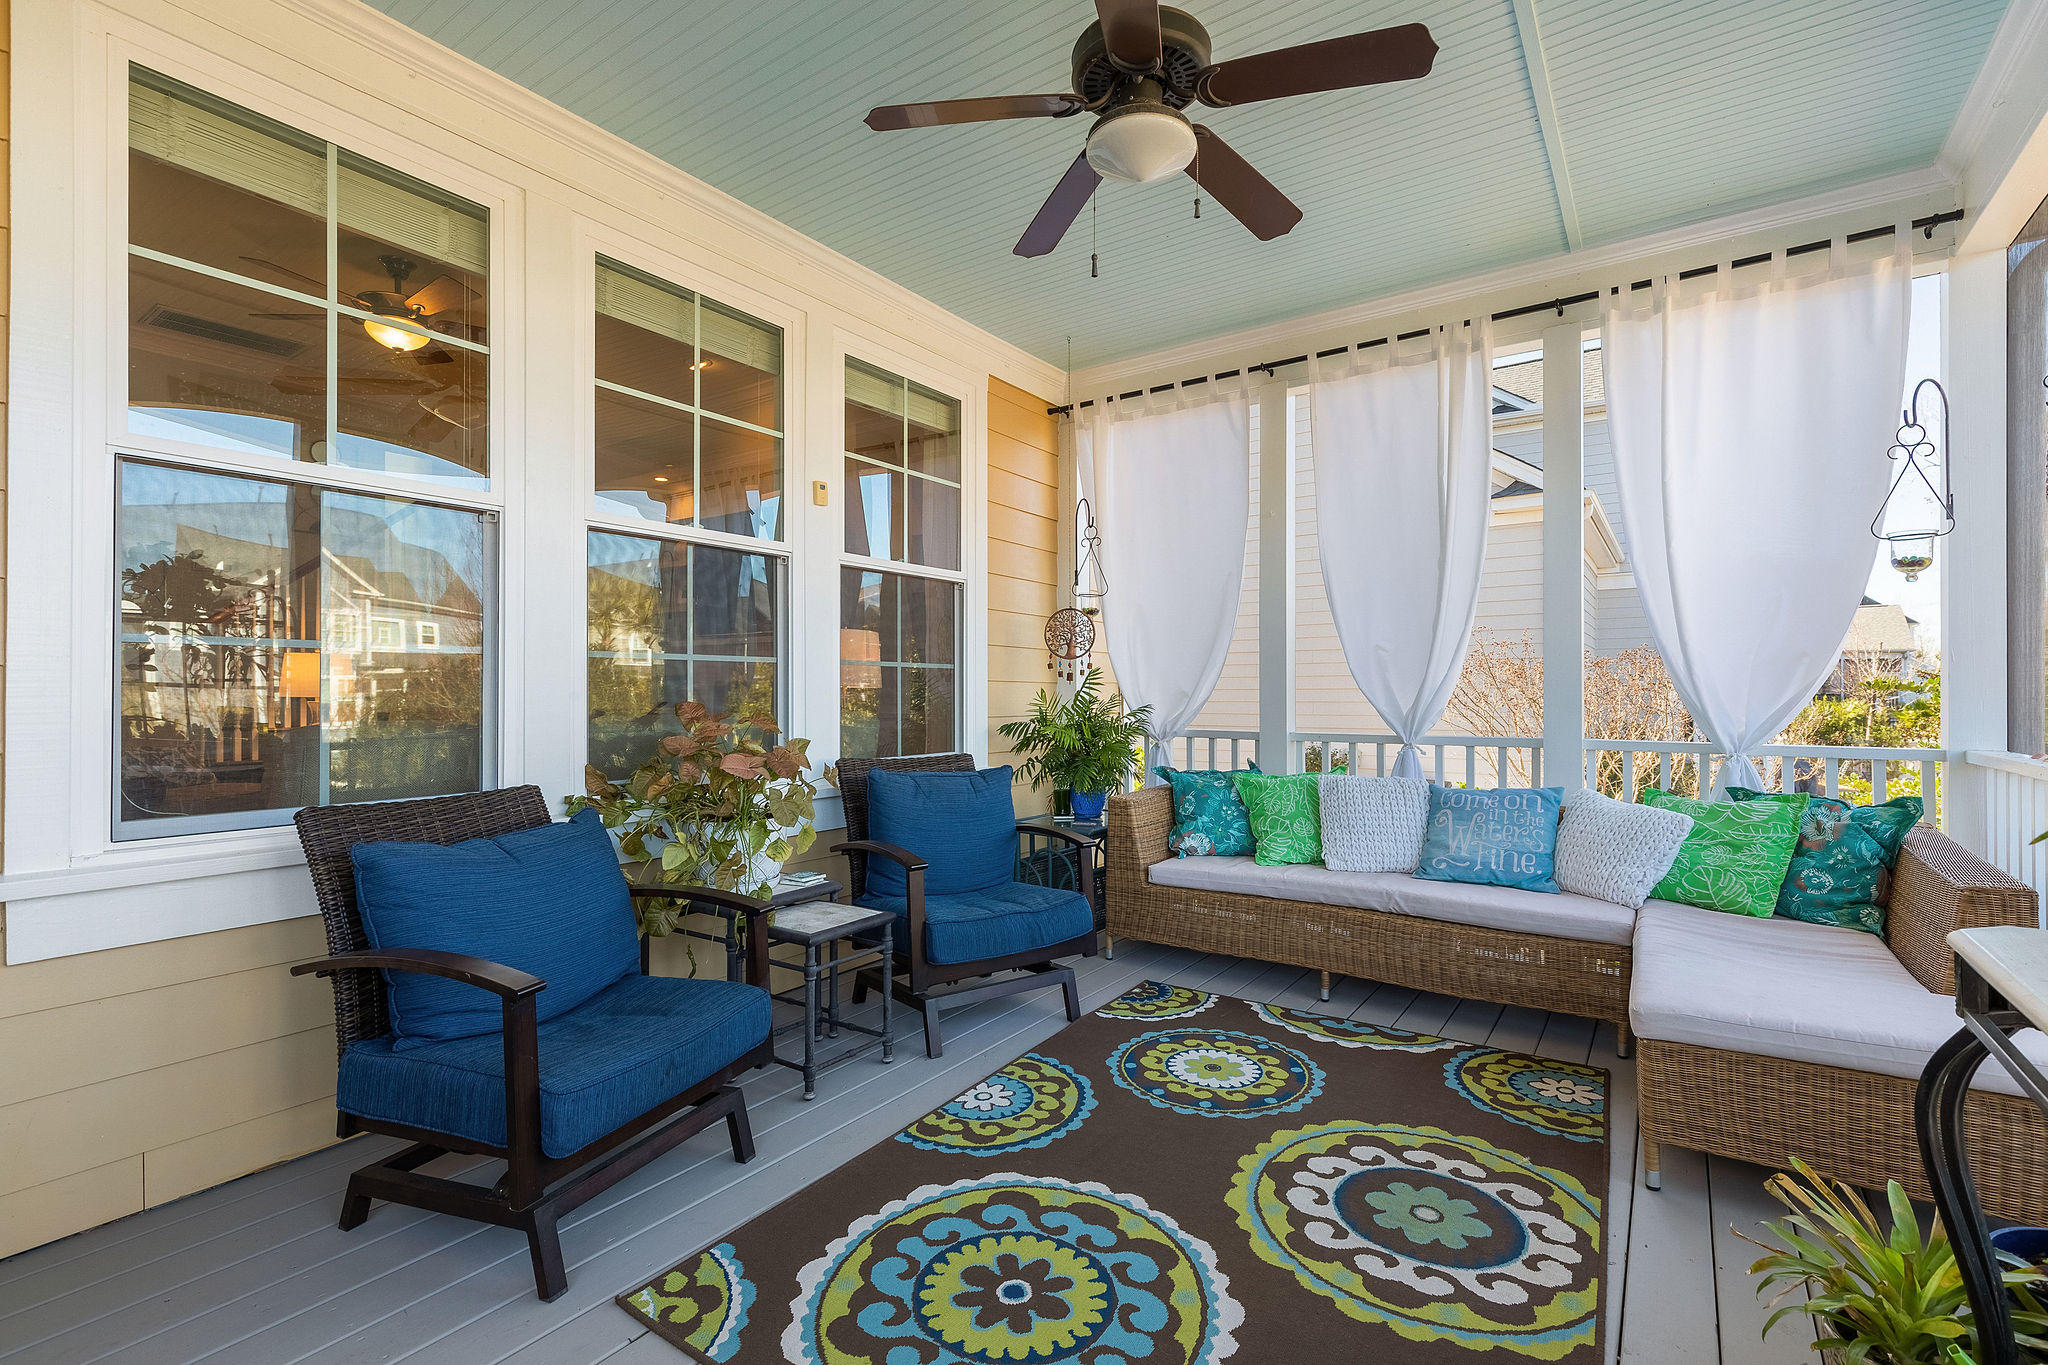 Dunes West Homes For Sale - 3212 Hatchway, Mount Pleasant, SC - 43